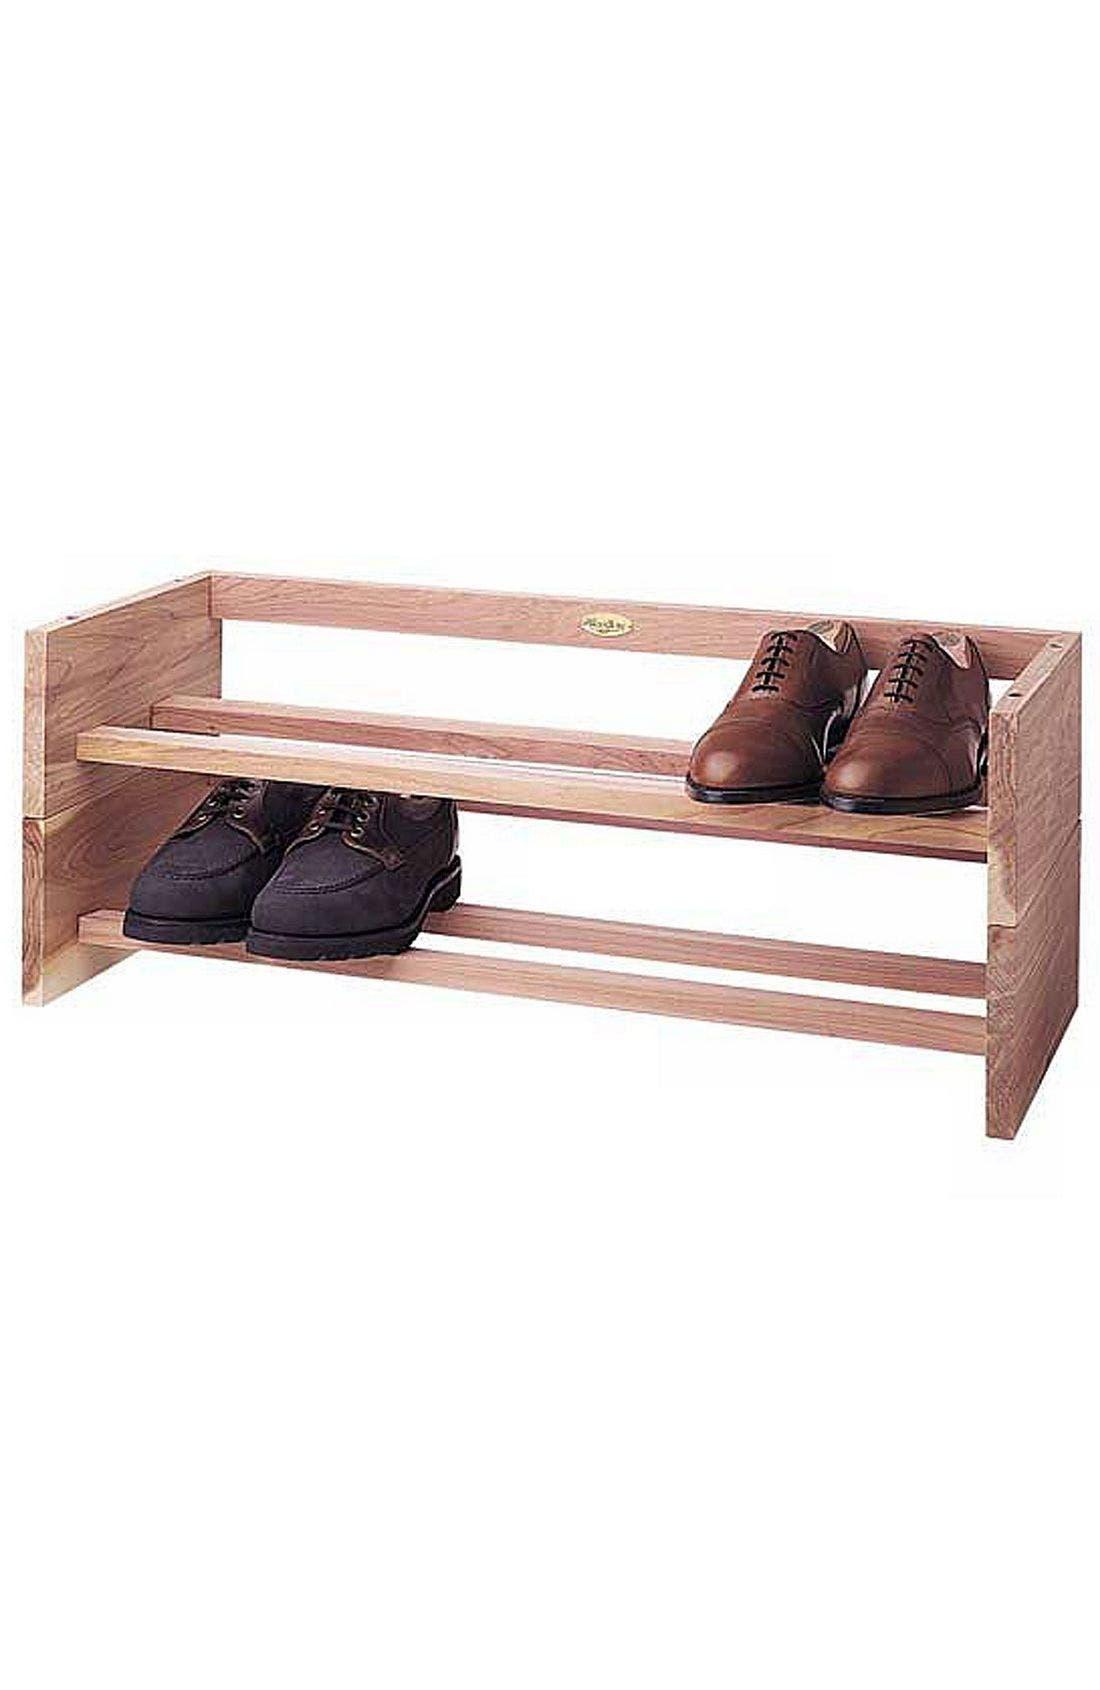 Alternate Image 1 Selected - Woodlore Cedar Shoe Rack